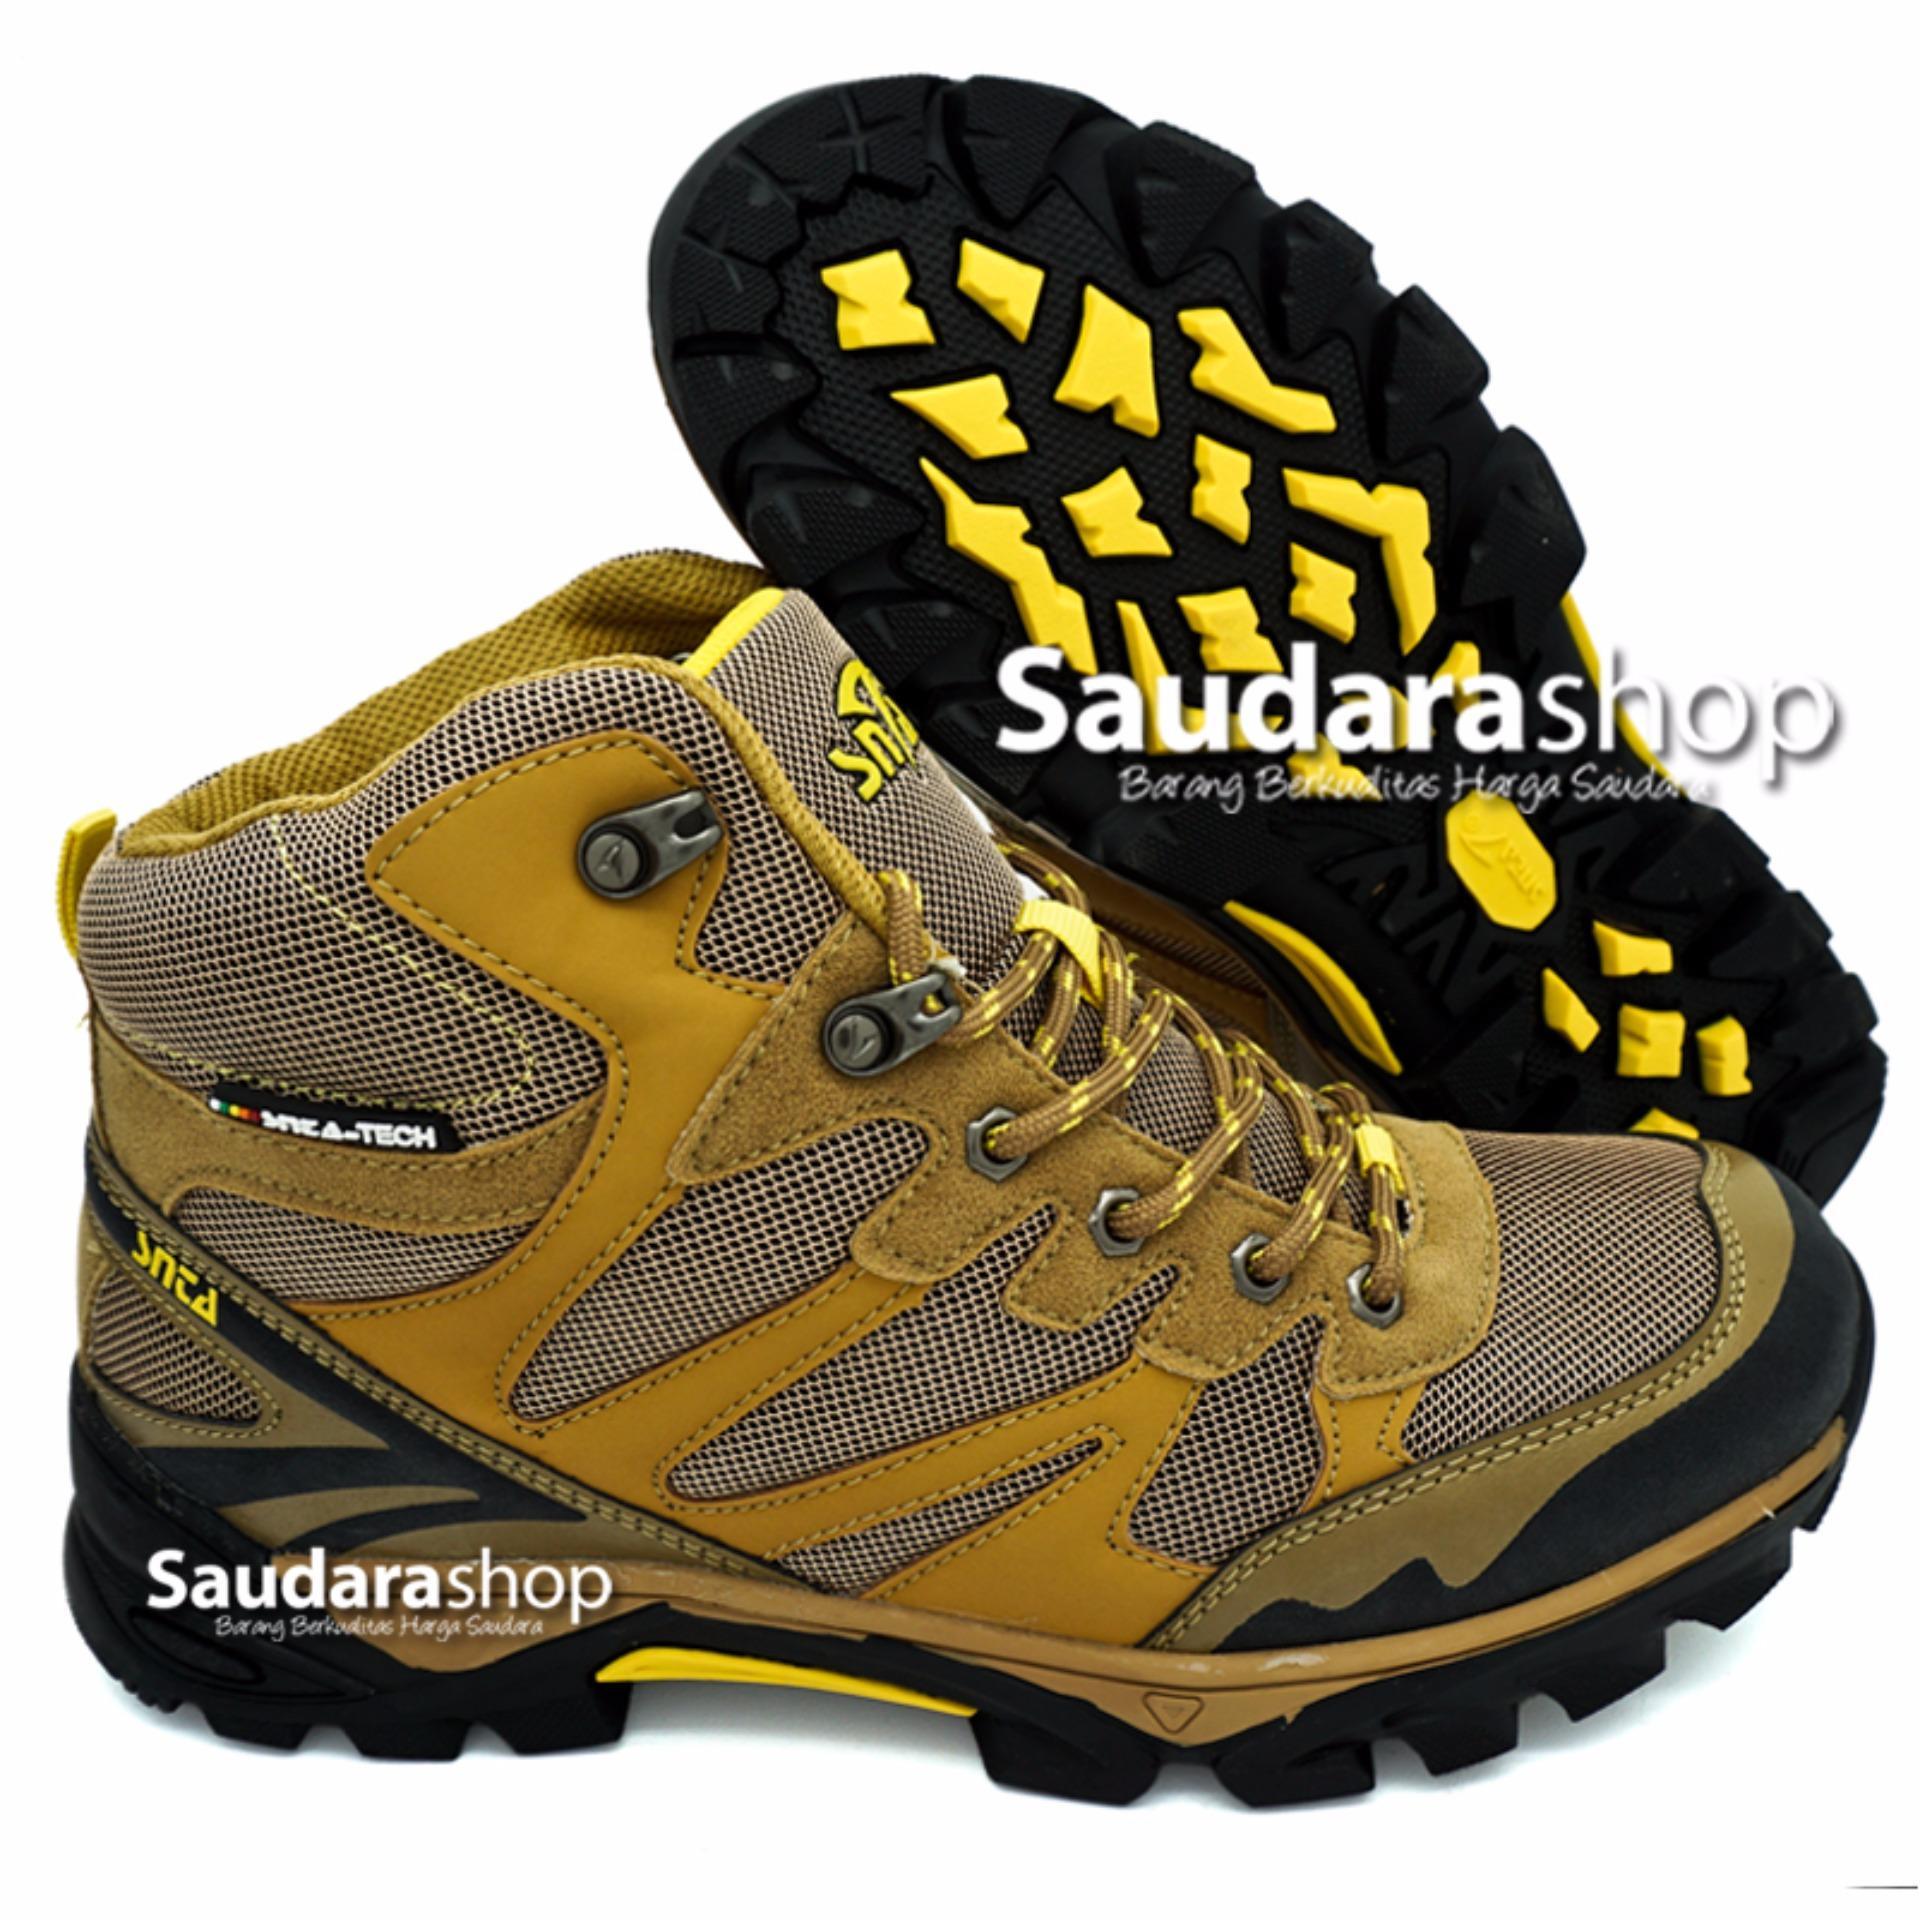 Spek Snta 478 Sepatu Gunung Sepatu Hiking Sepatu Outdoor Brown Yellow